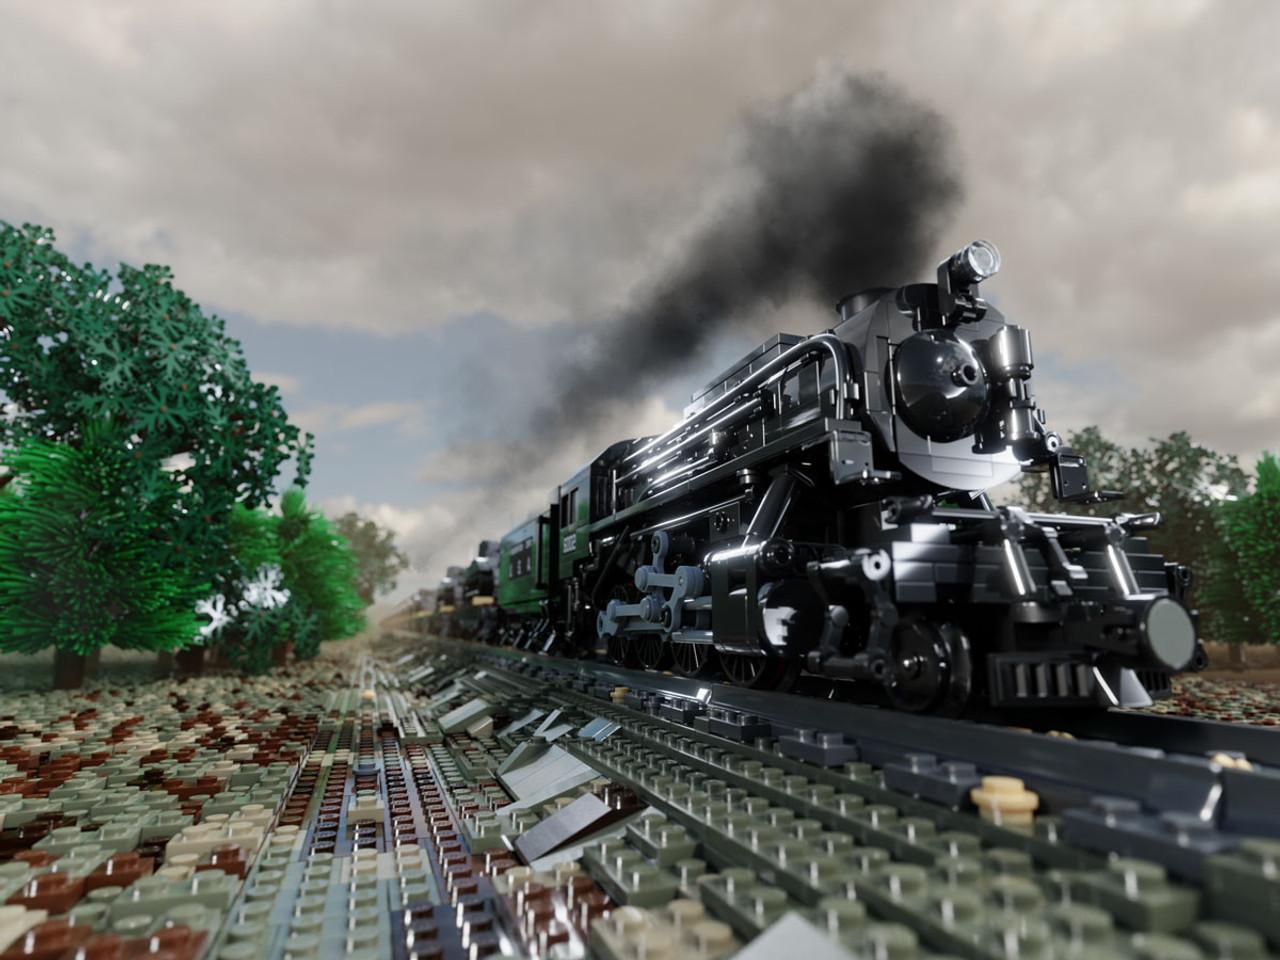 S160 Locomotive - US Army Transportation Corps